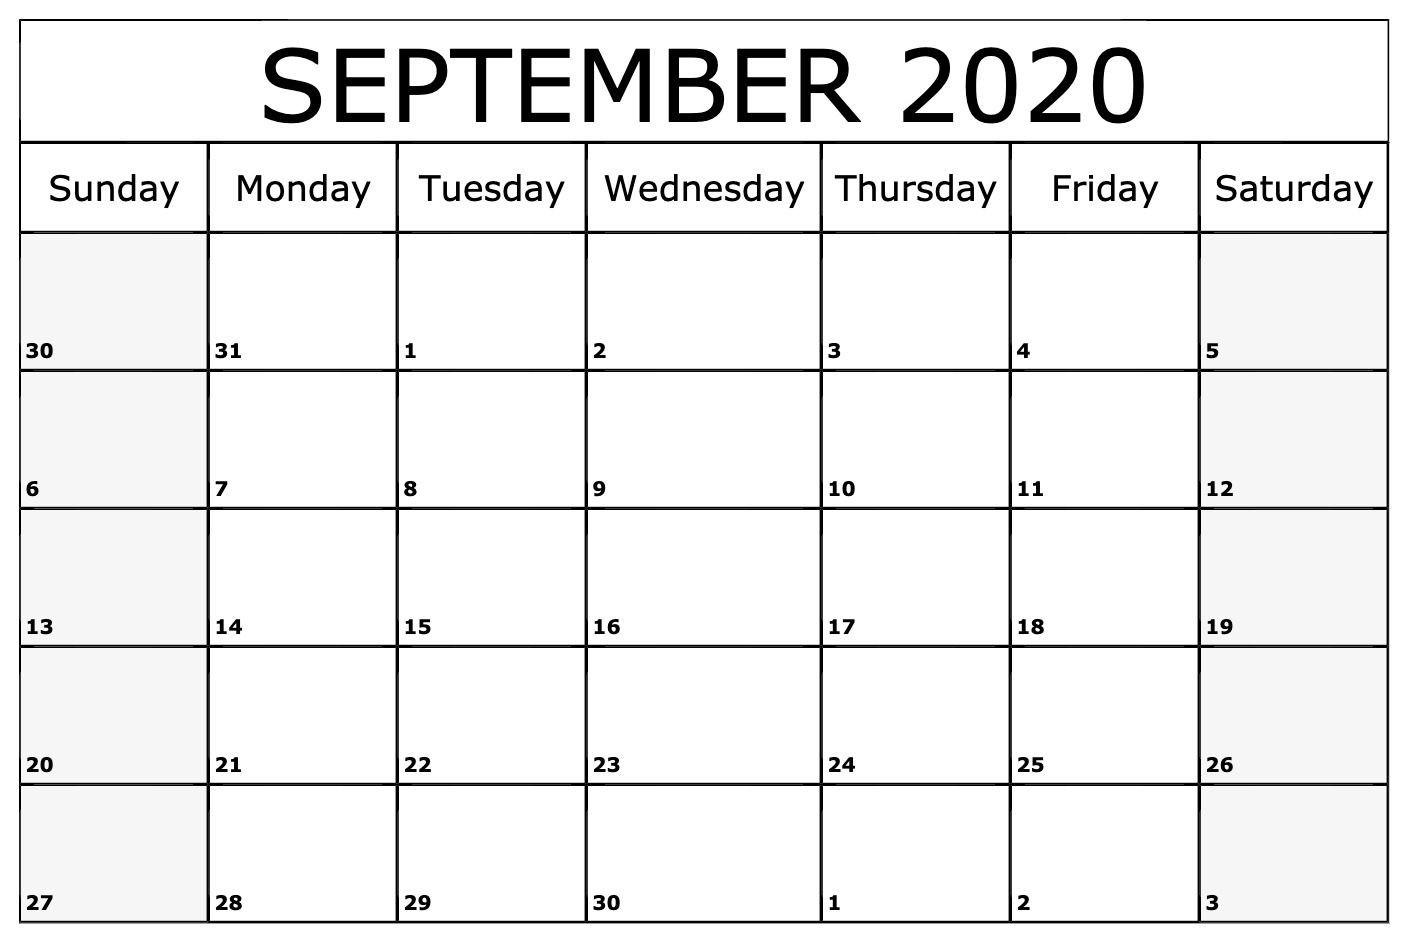 Awesome September 2020 Calendar Pdf, Word, Excel Printable  Free Online Calendars 2020 Printable